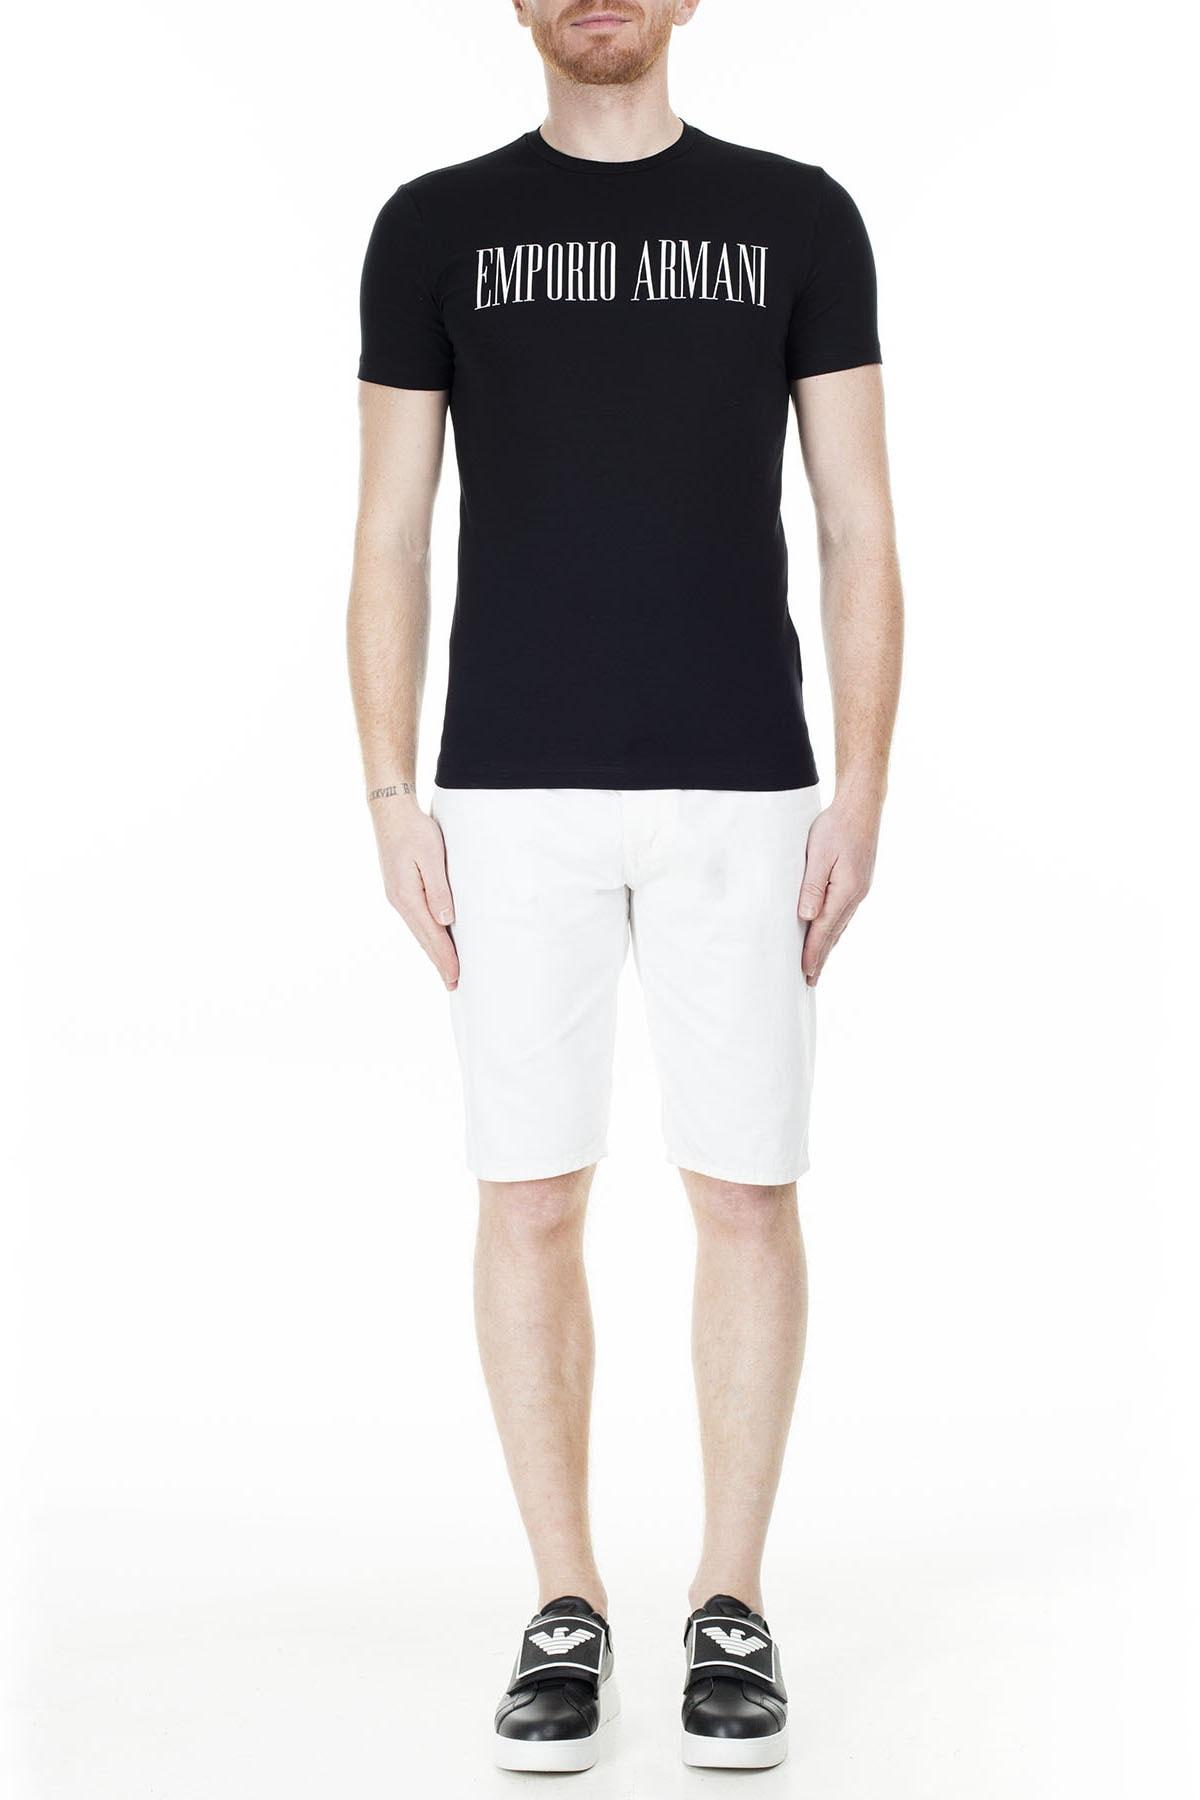 Emporio Armani Regular Fit T Shirt Erkek T Shirt S 6G1Td5 1J0Az 0002 S 6G1TD5 1J0AZ 0002 4